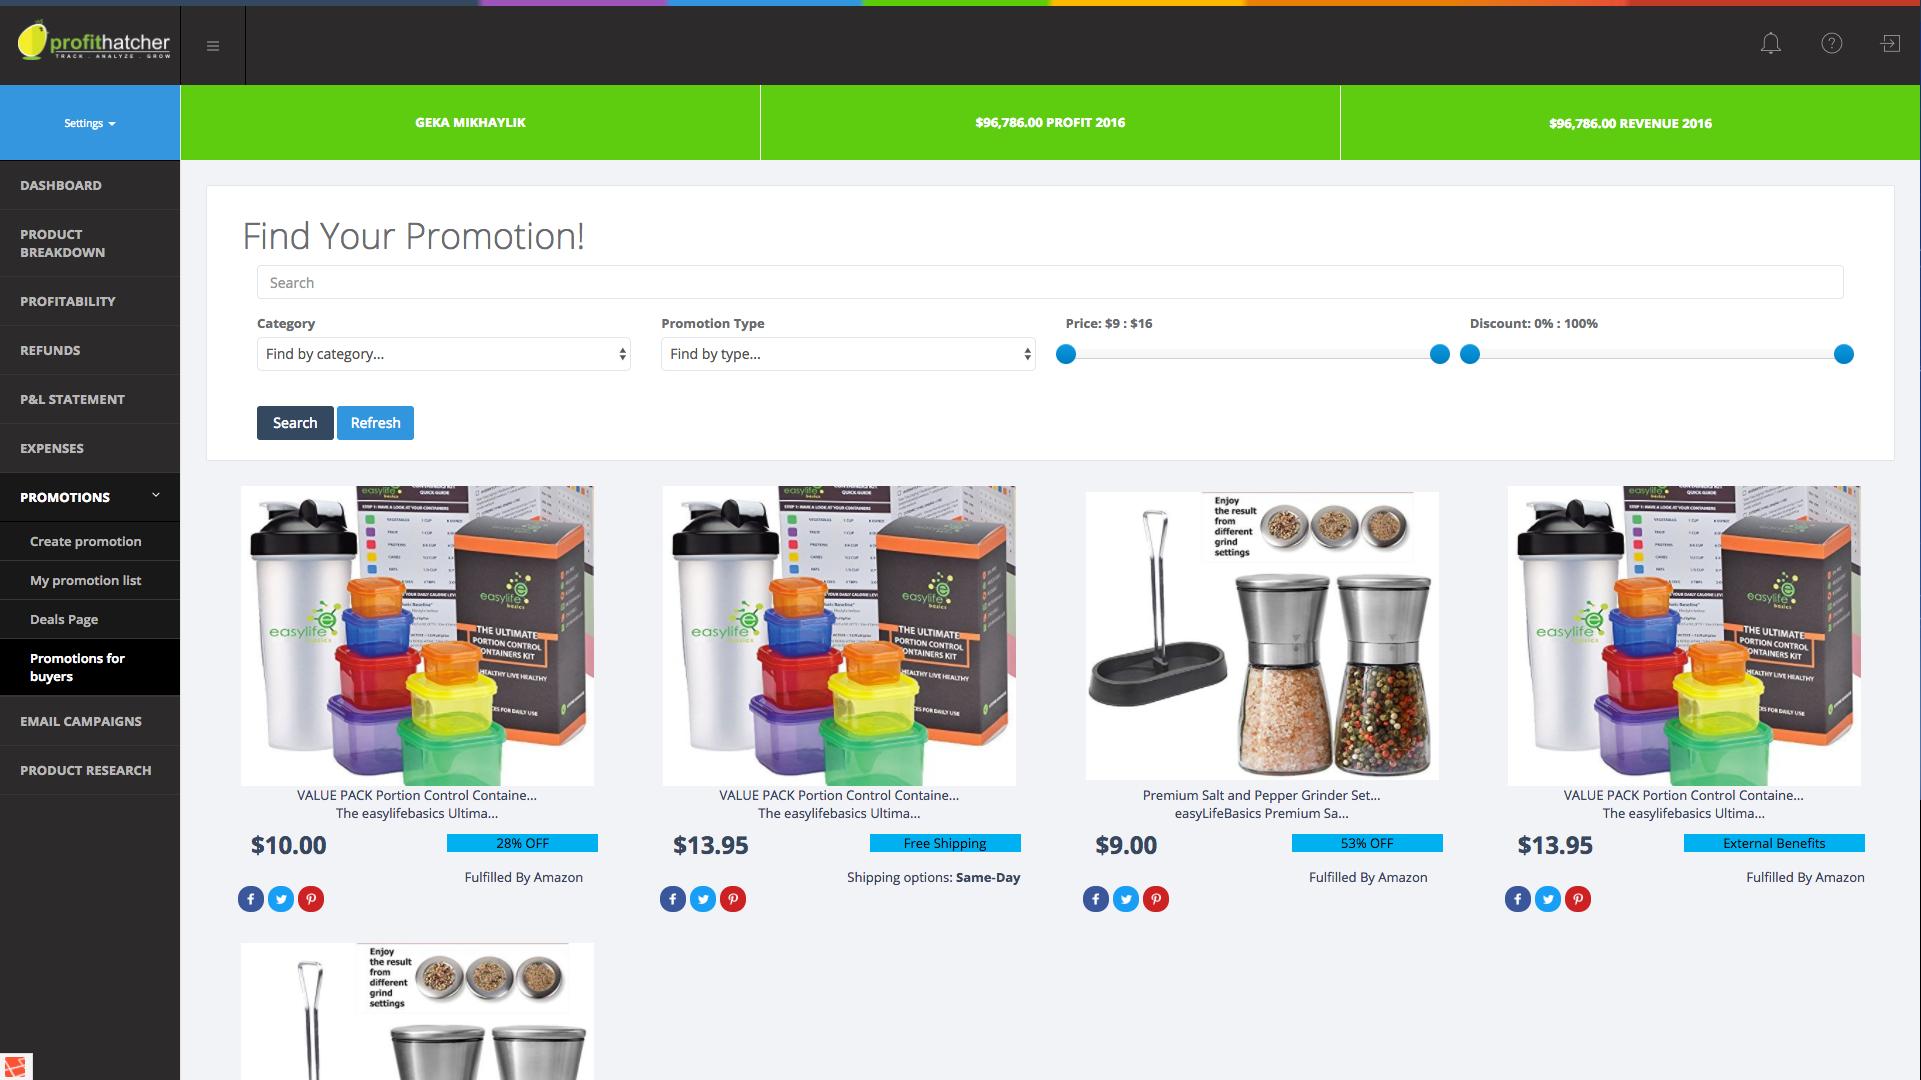 amazon-sales-improvement-service5b4c991366483f0309b9c528